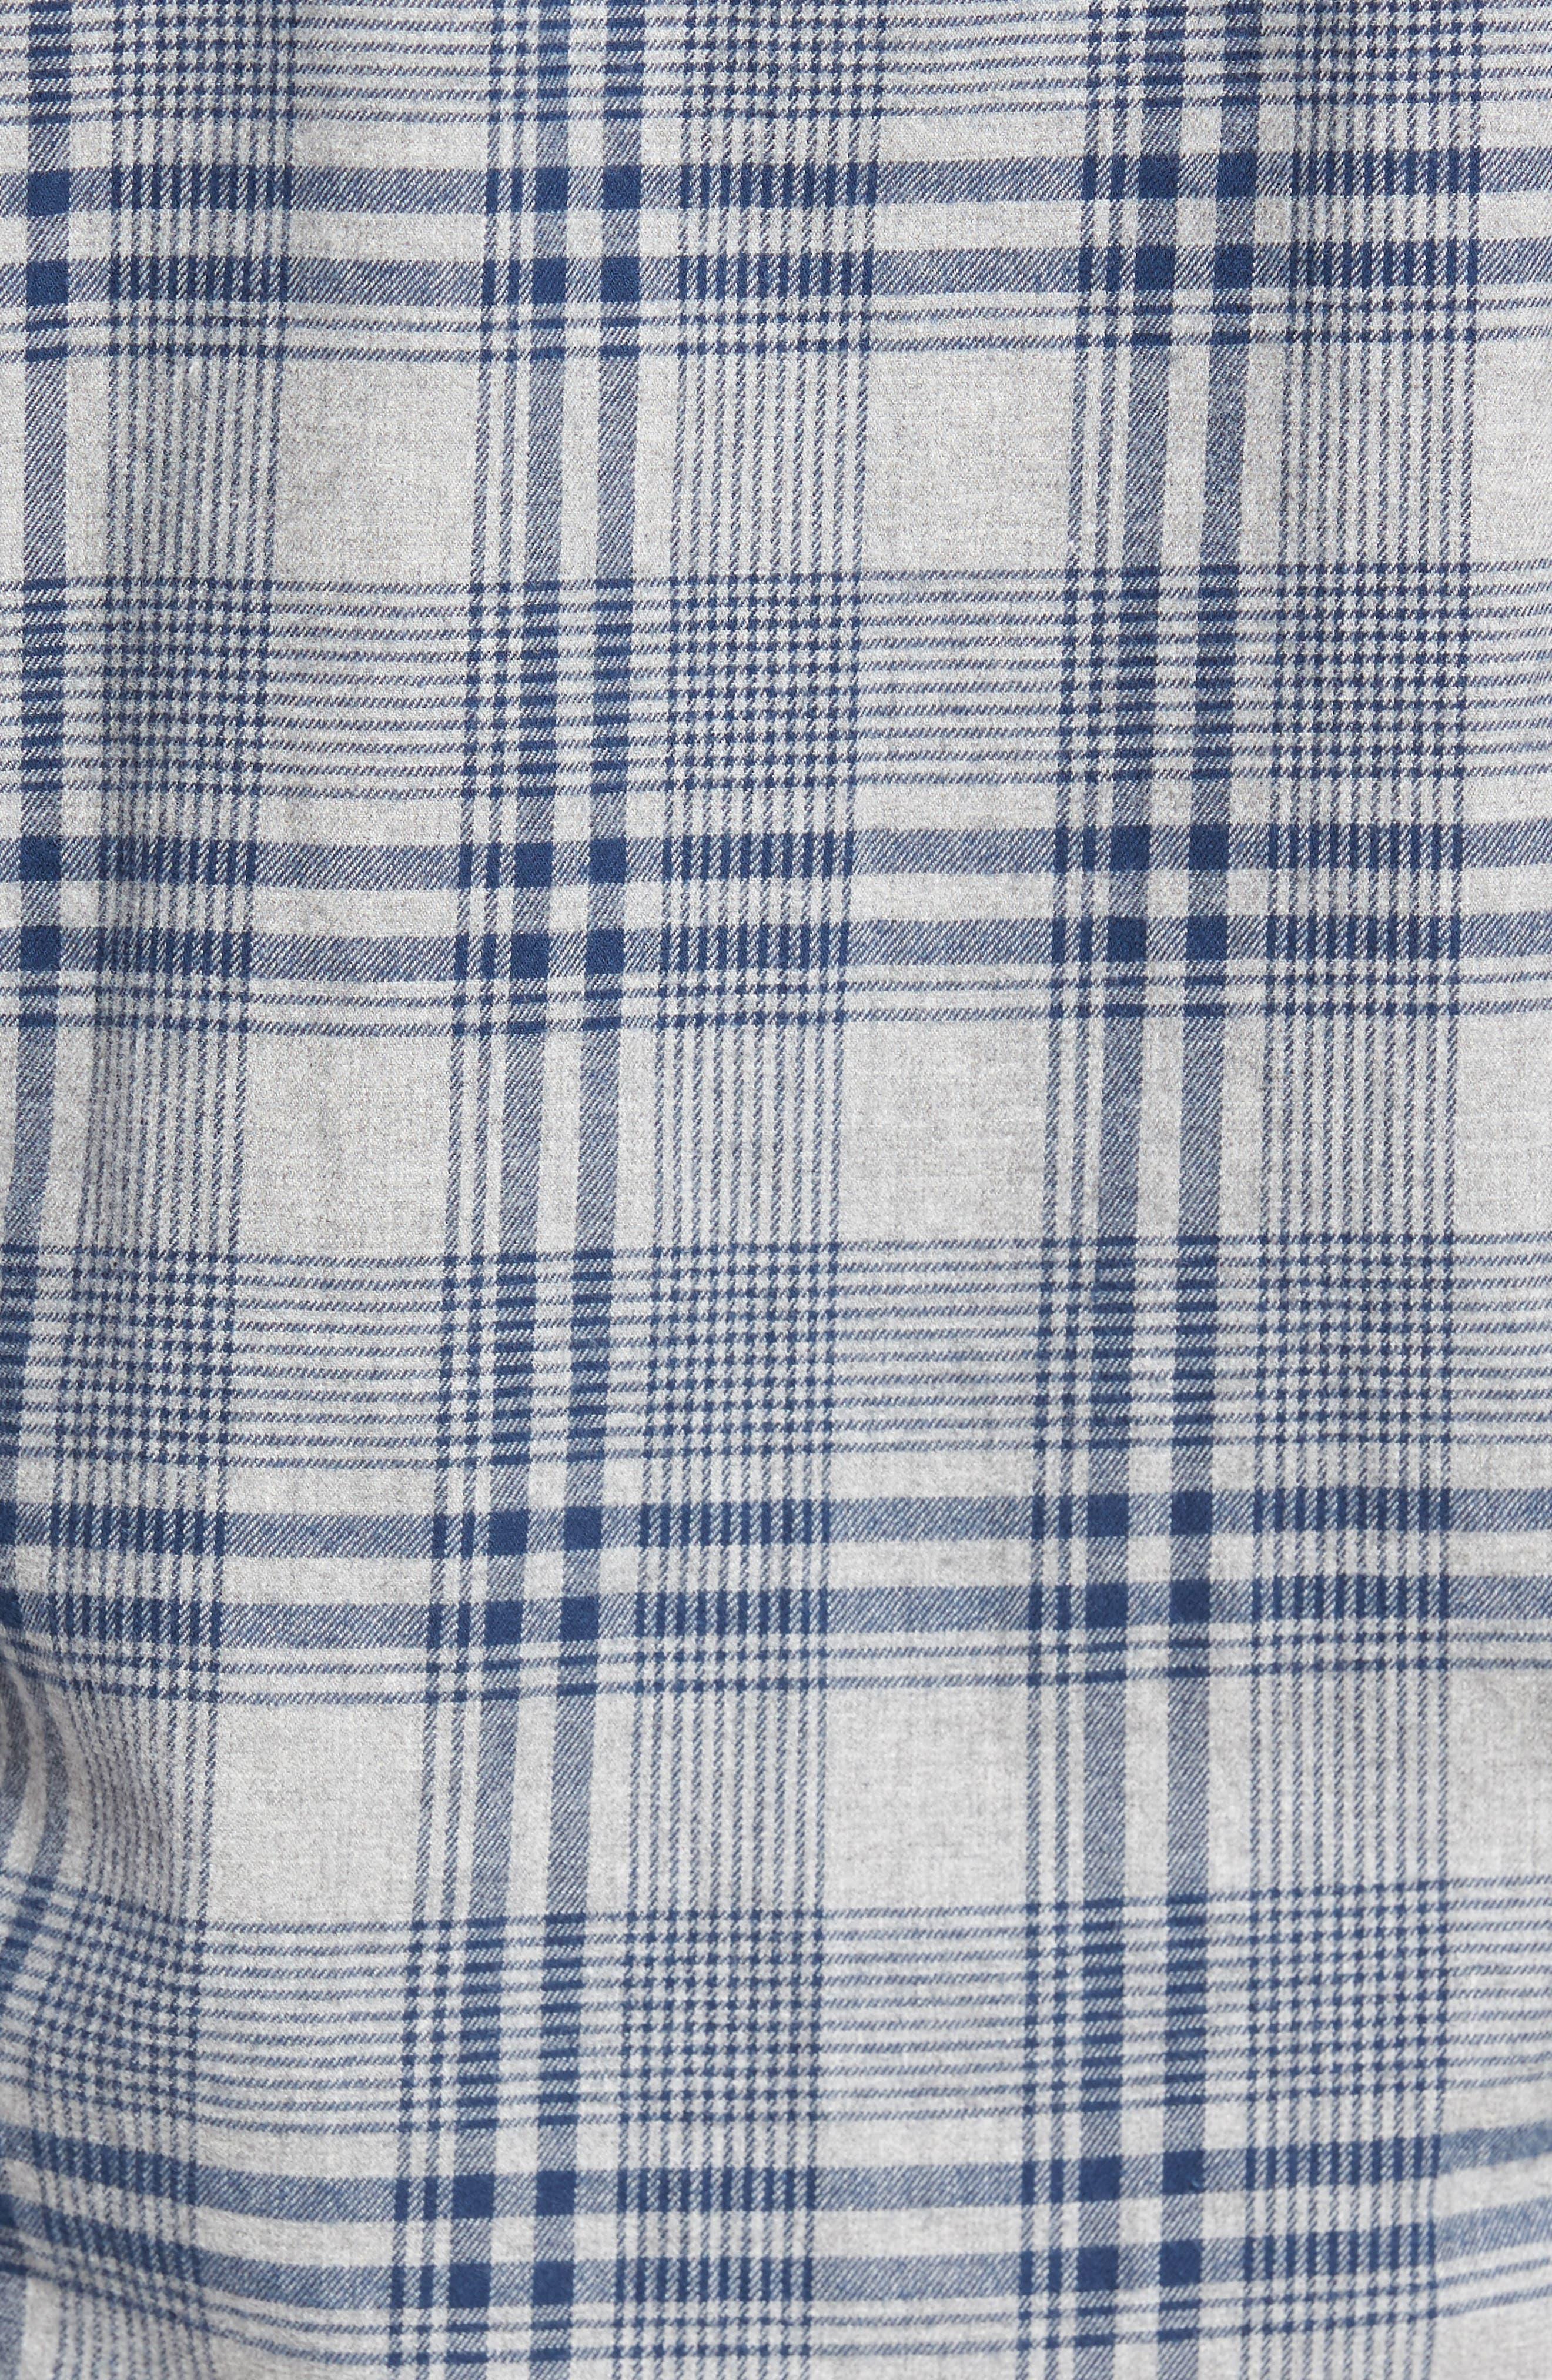 Slim Fit Brushed Plaid Sport Shirt,                             Alternate thumbnail 5, color,                             Rivercrest Plaid Navy